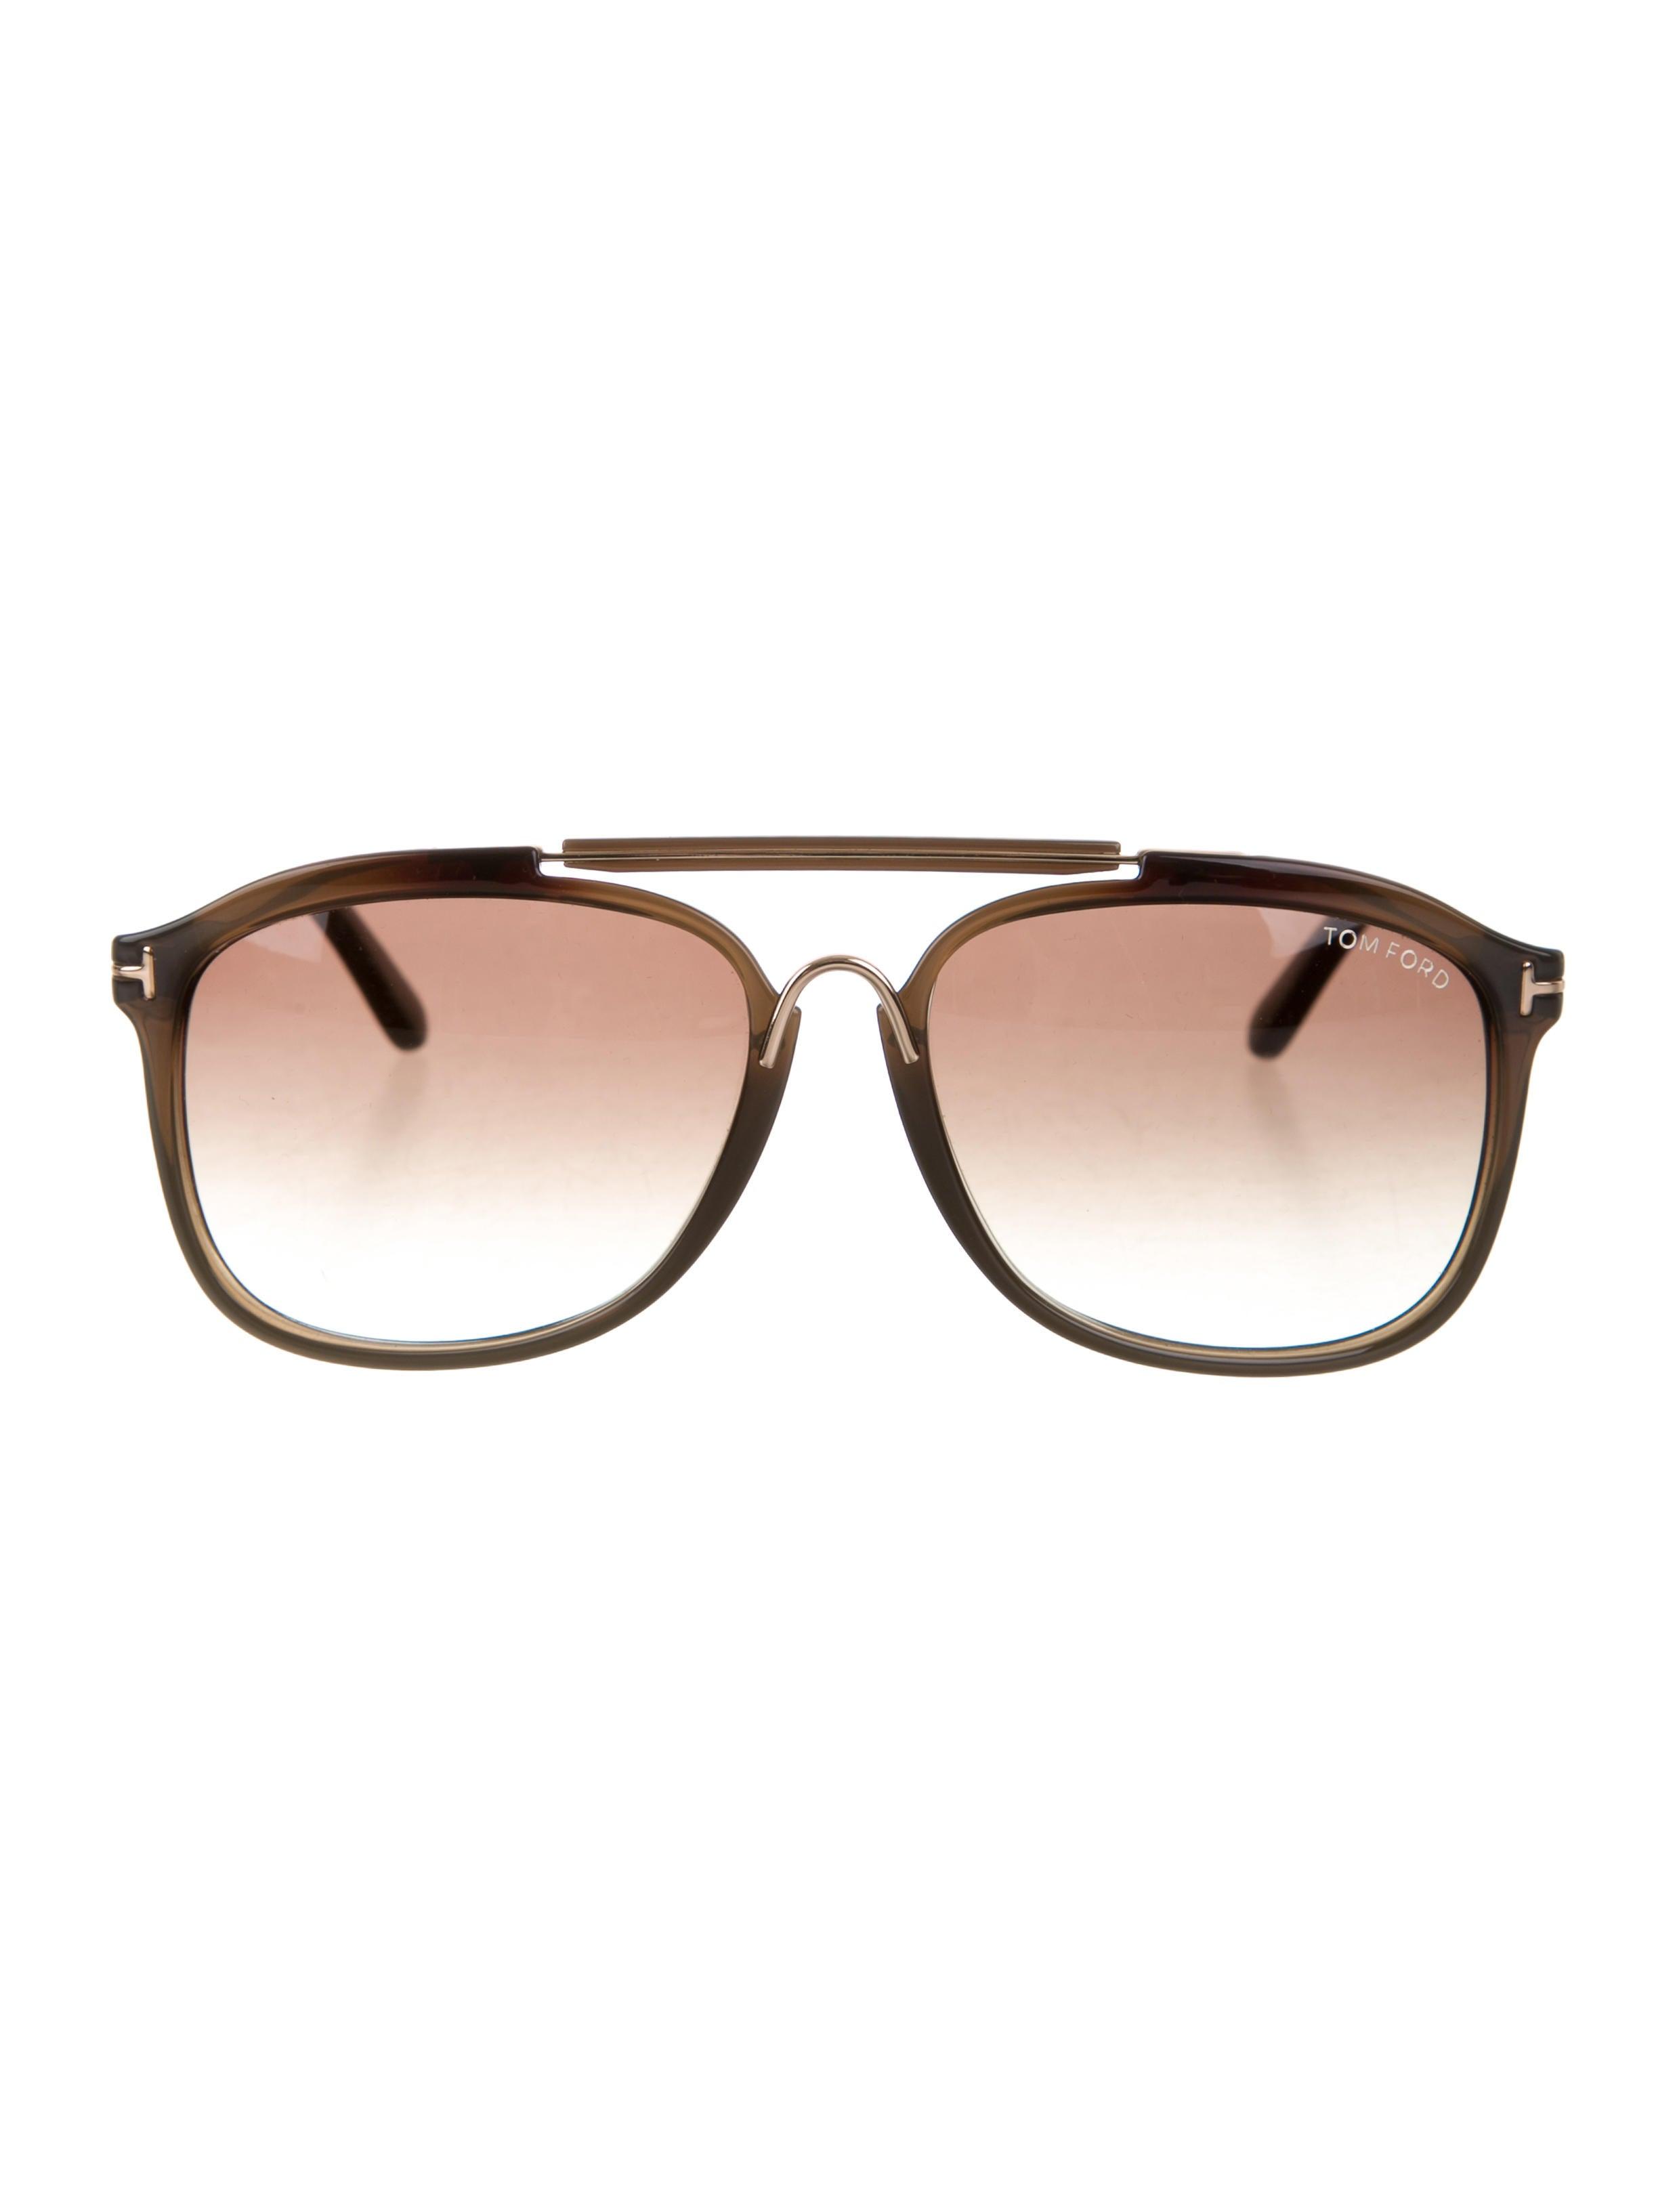 bee52a1ec1 Tom Ford Cade Aviator Sunglasses w  Tags - Accessories - TOM37847 ...